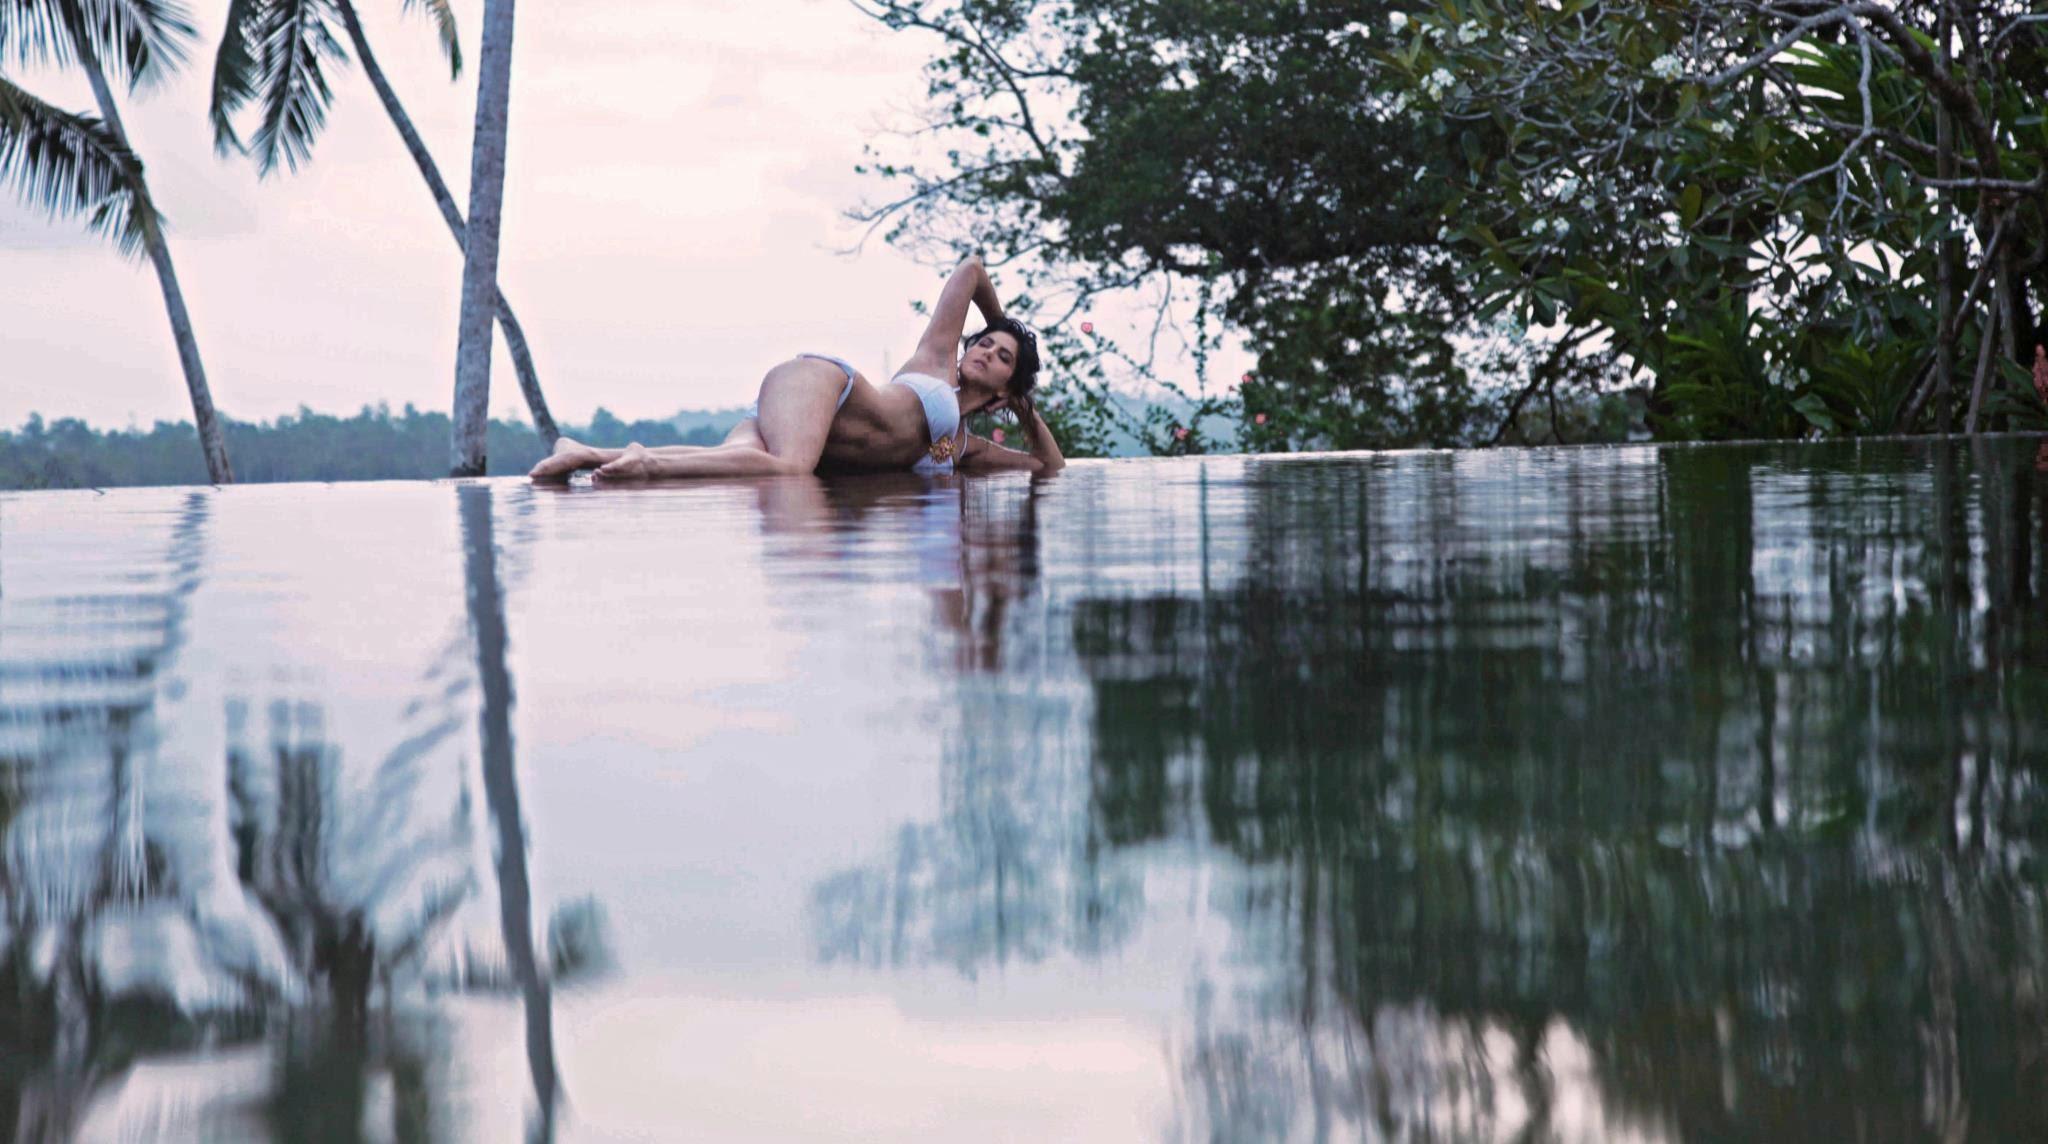 Jism 2 Latest HQ Movie Stills - Featuring Hot Sunny Leone